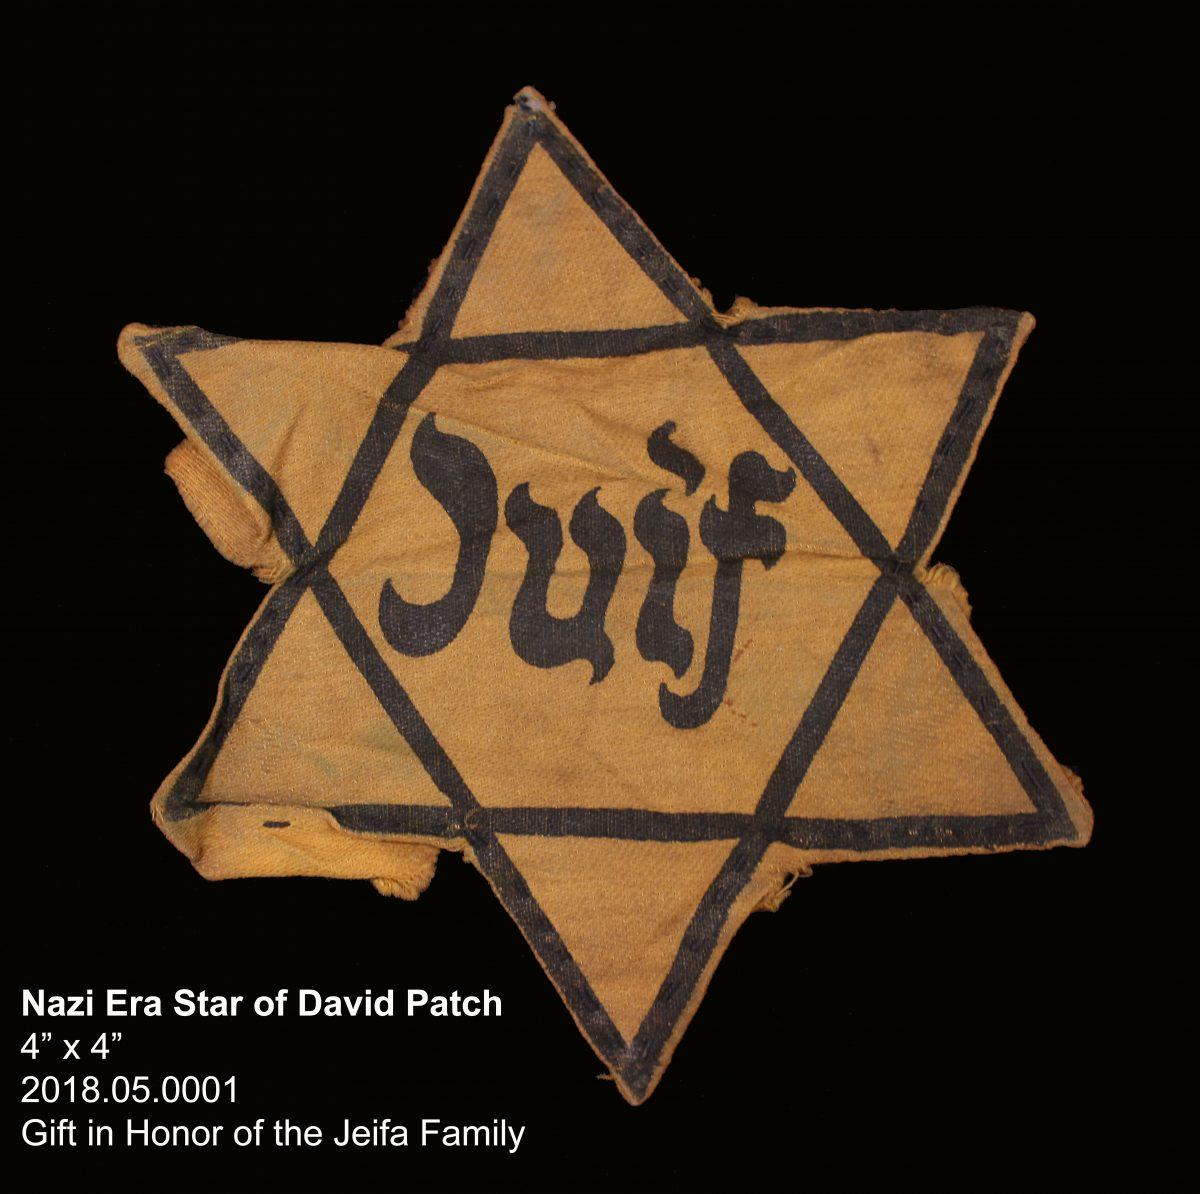 Object of the Month – Nazi Era Star of David